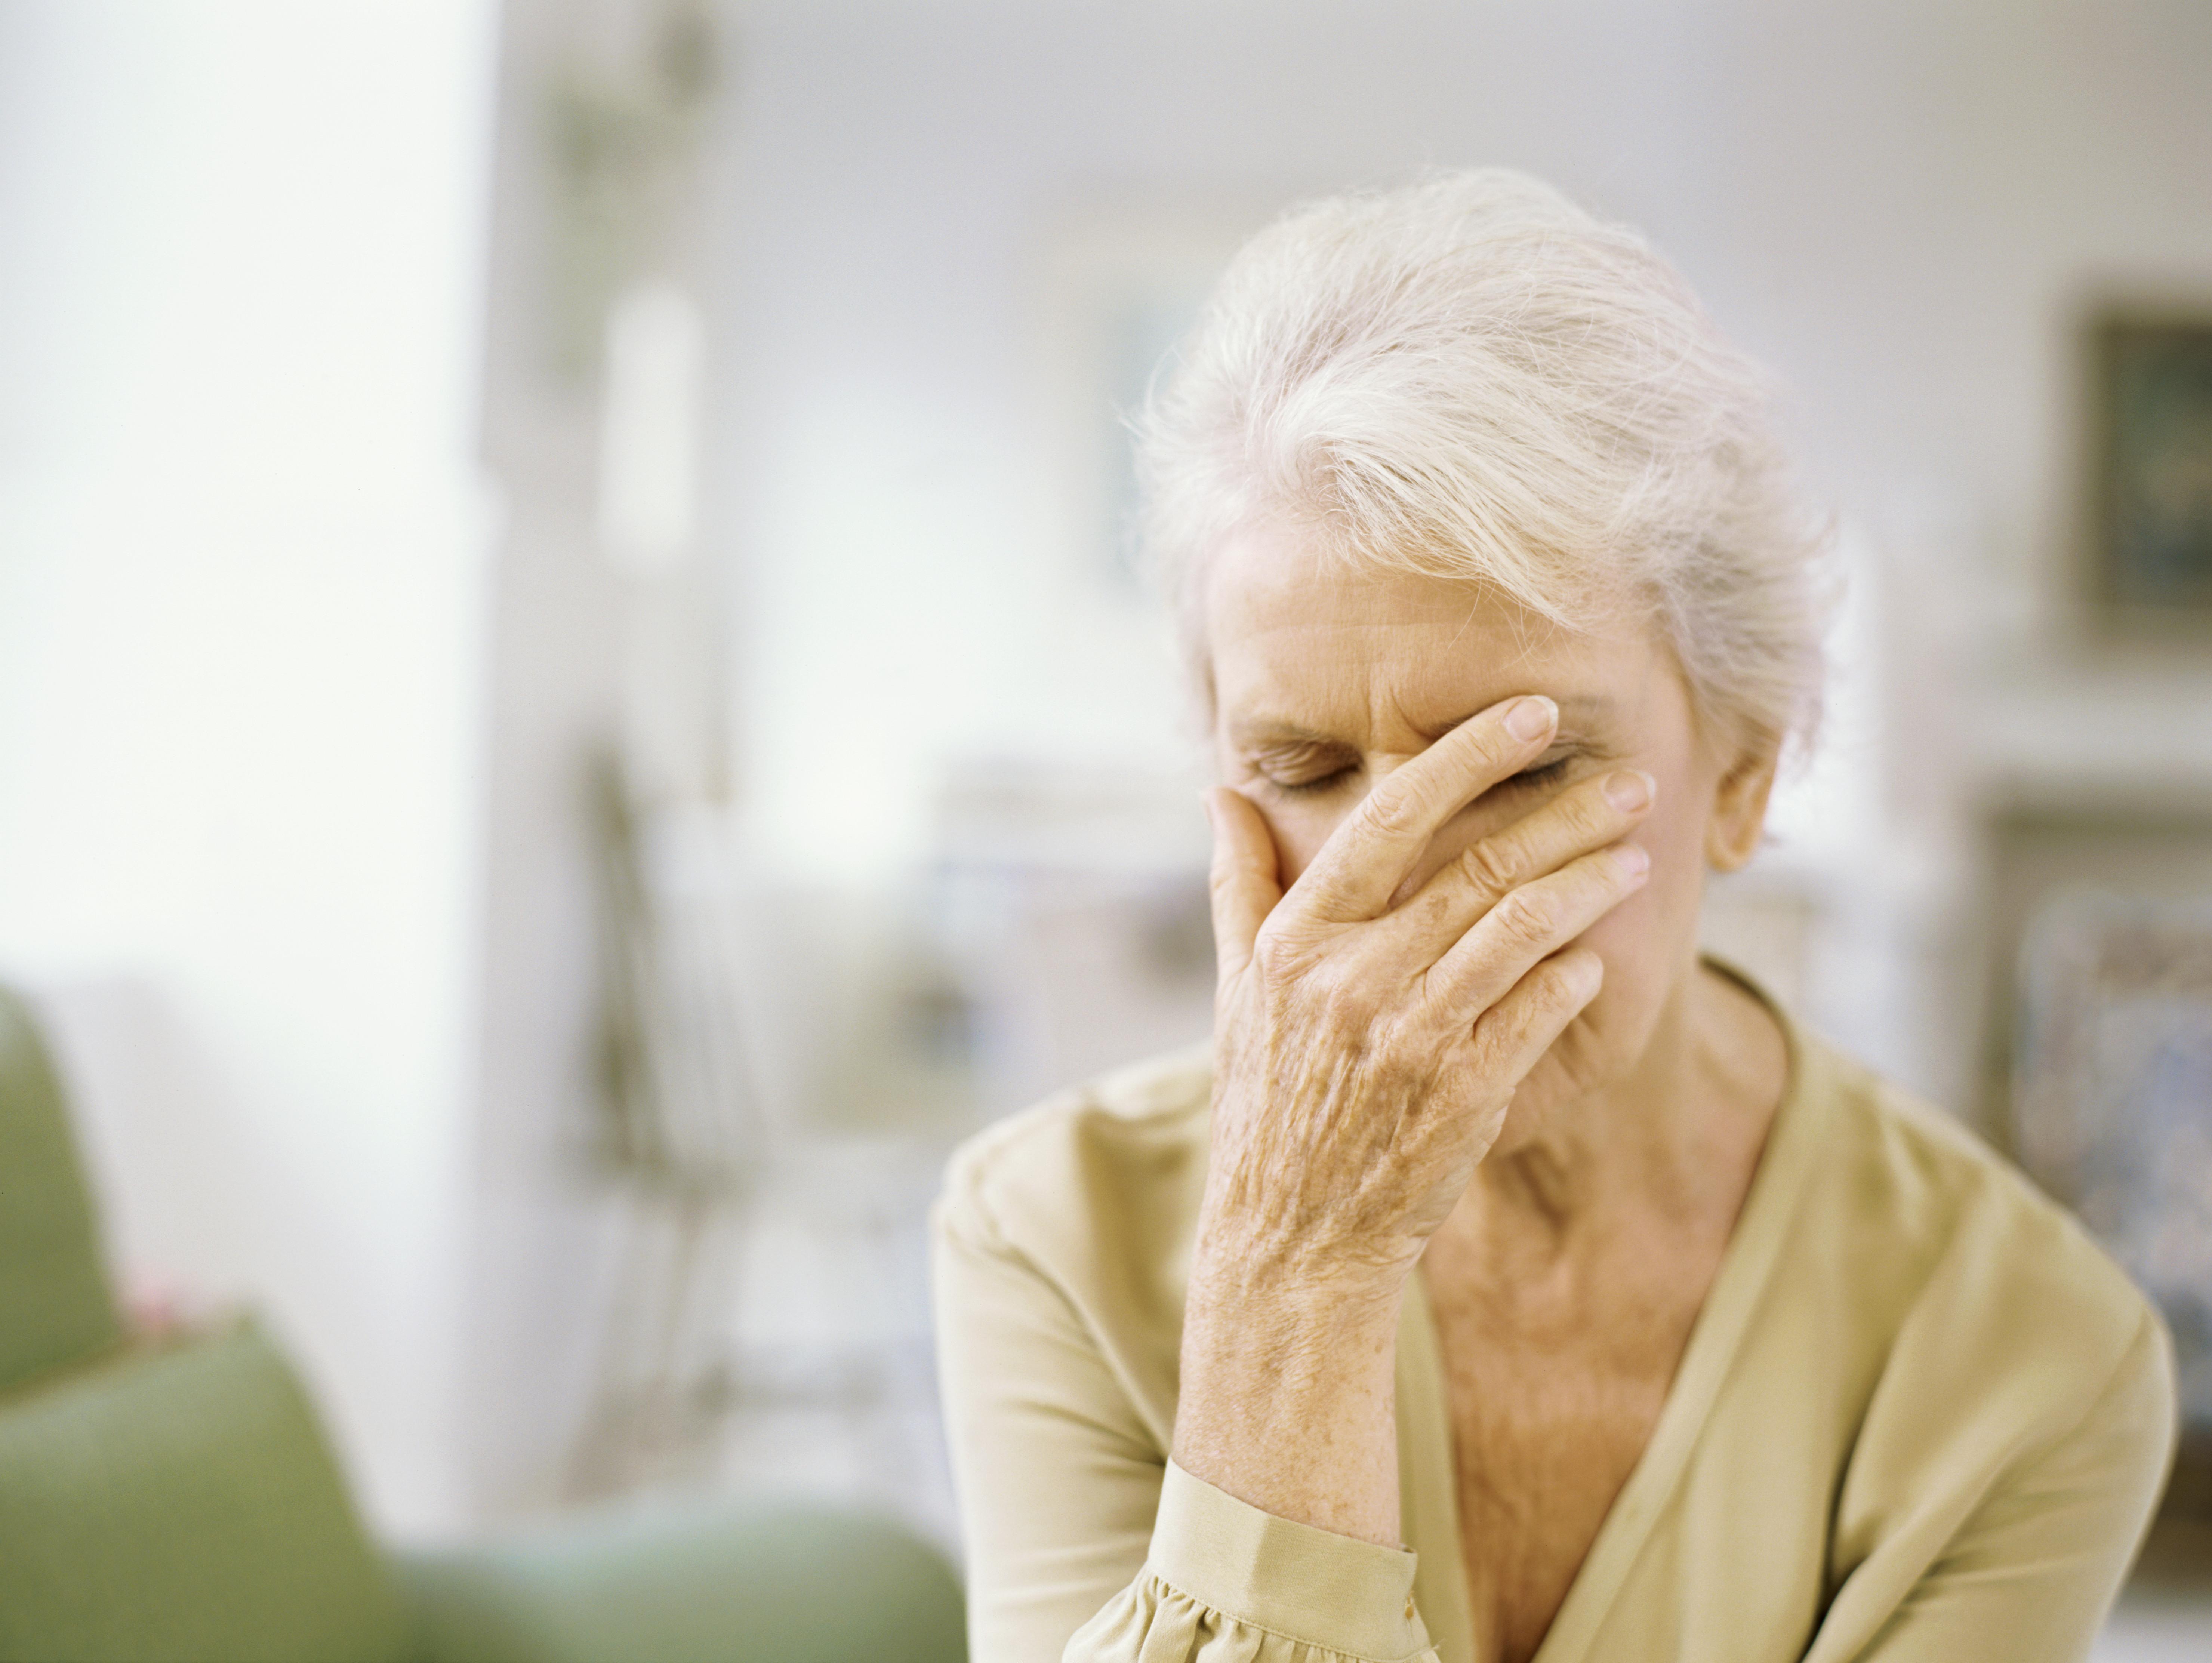 Senior woman regretting a mistake